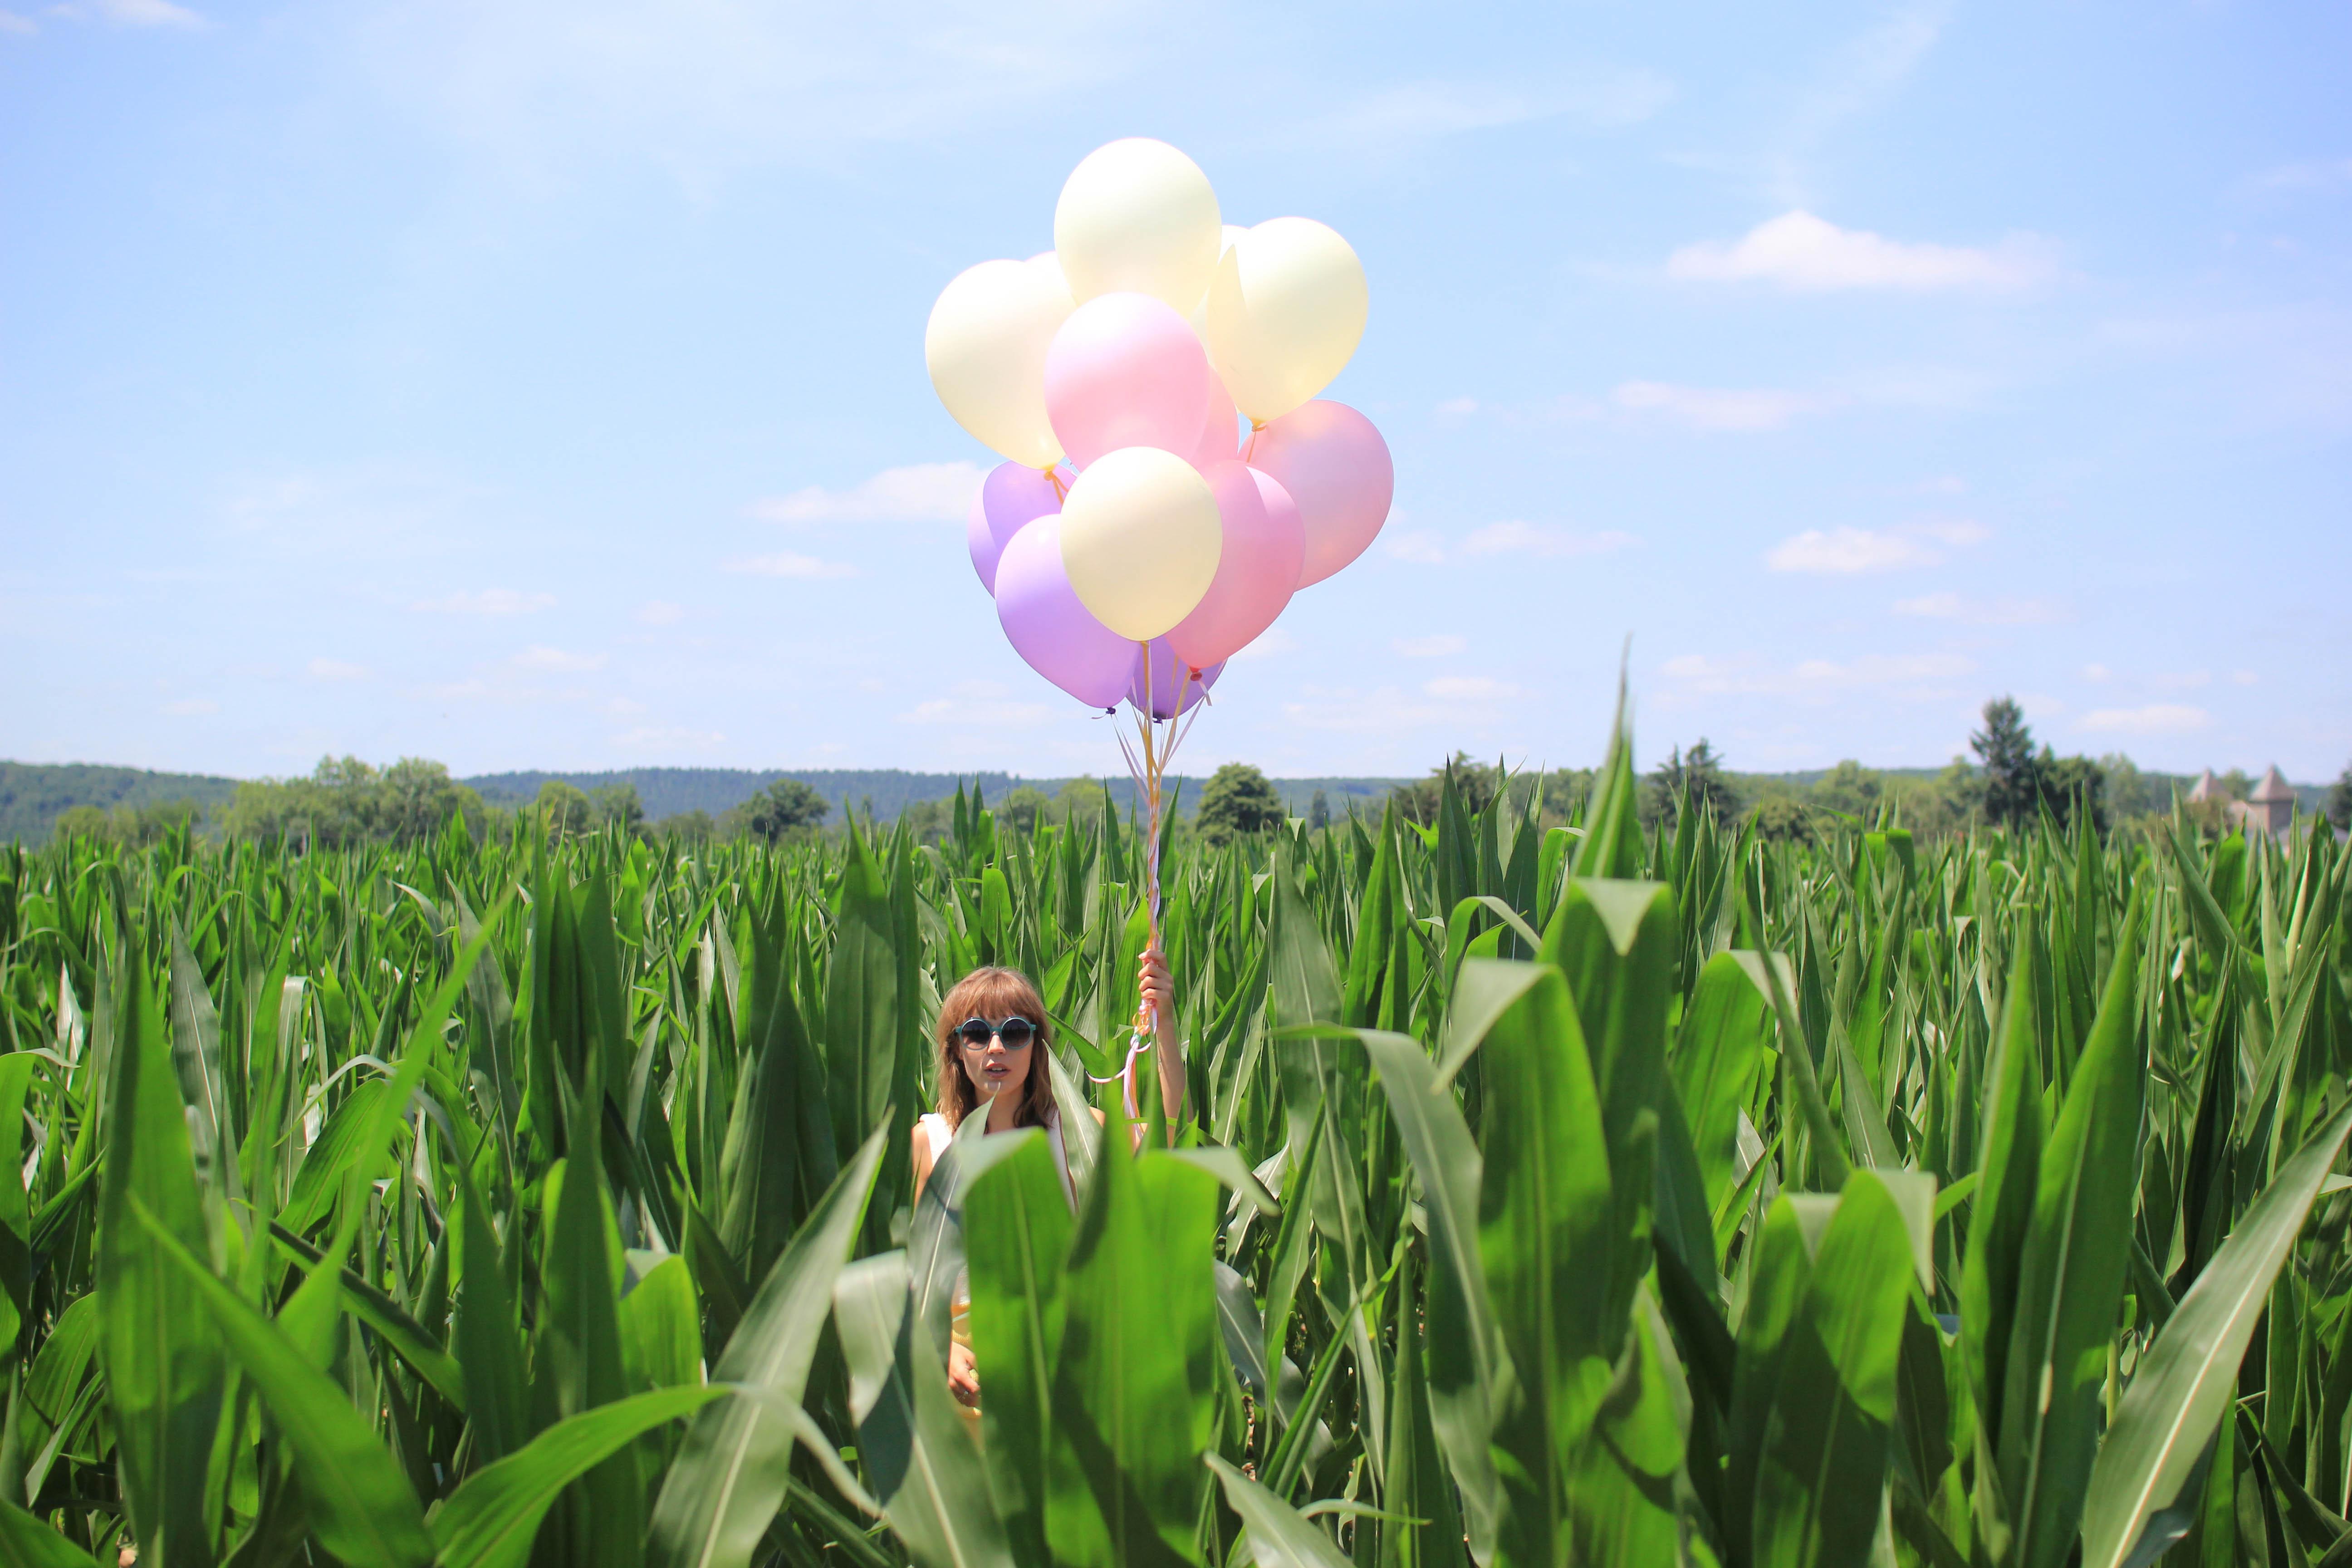 Combinaison en crochet et ballon  | SP4NK BLOG